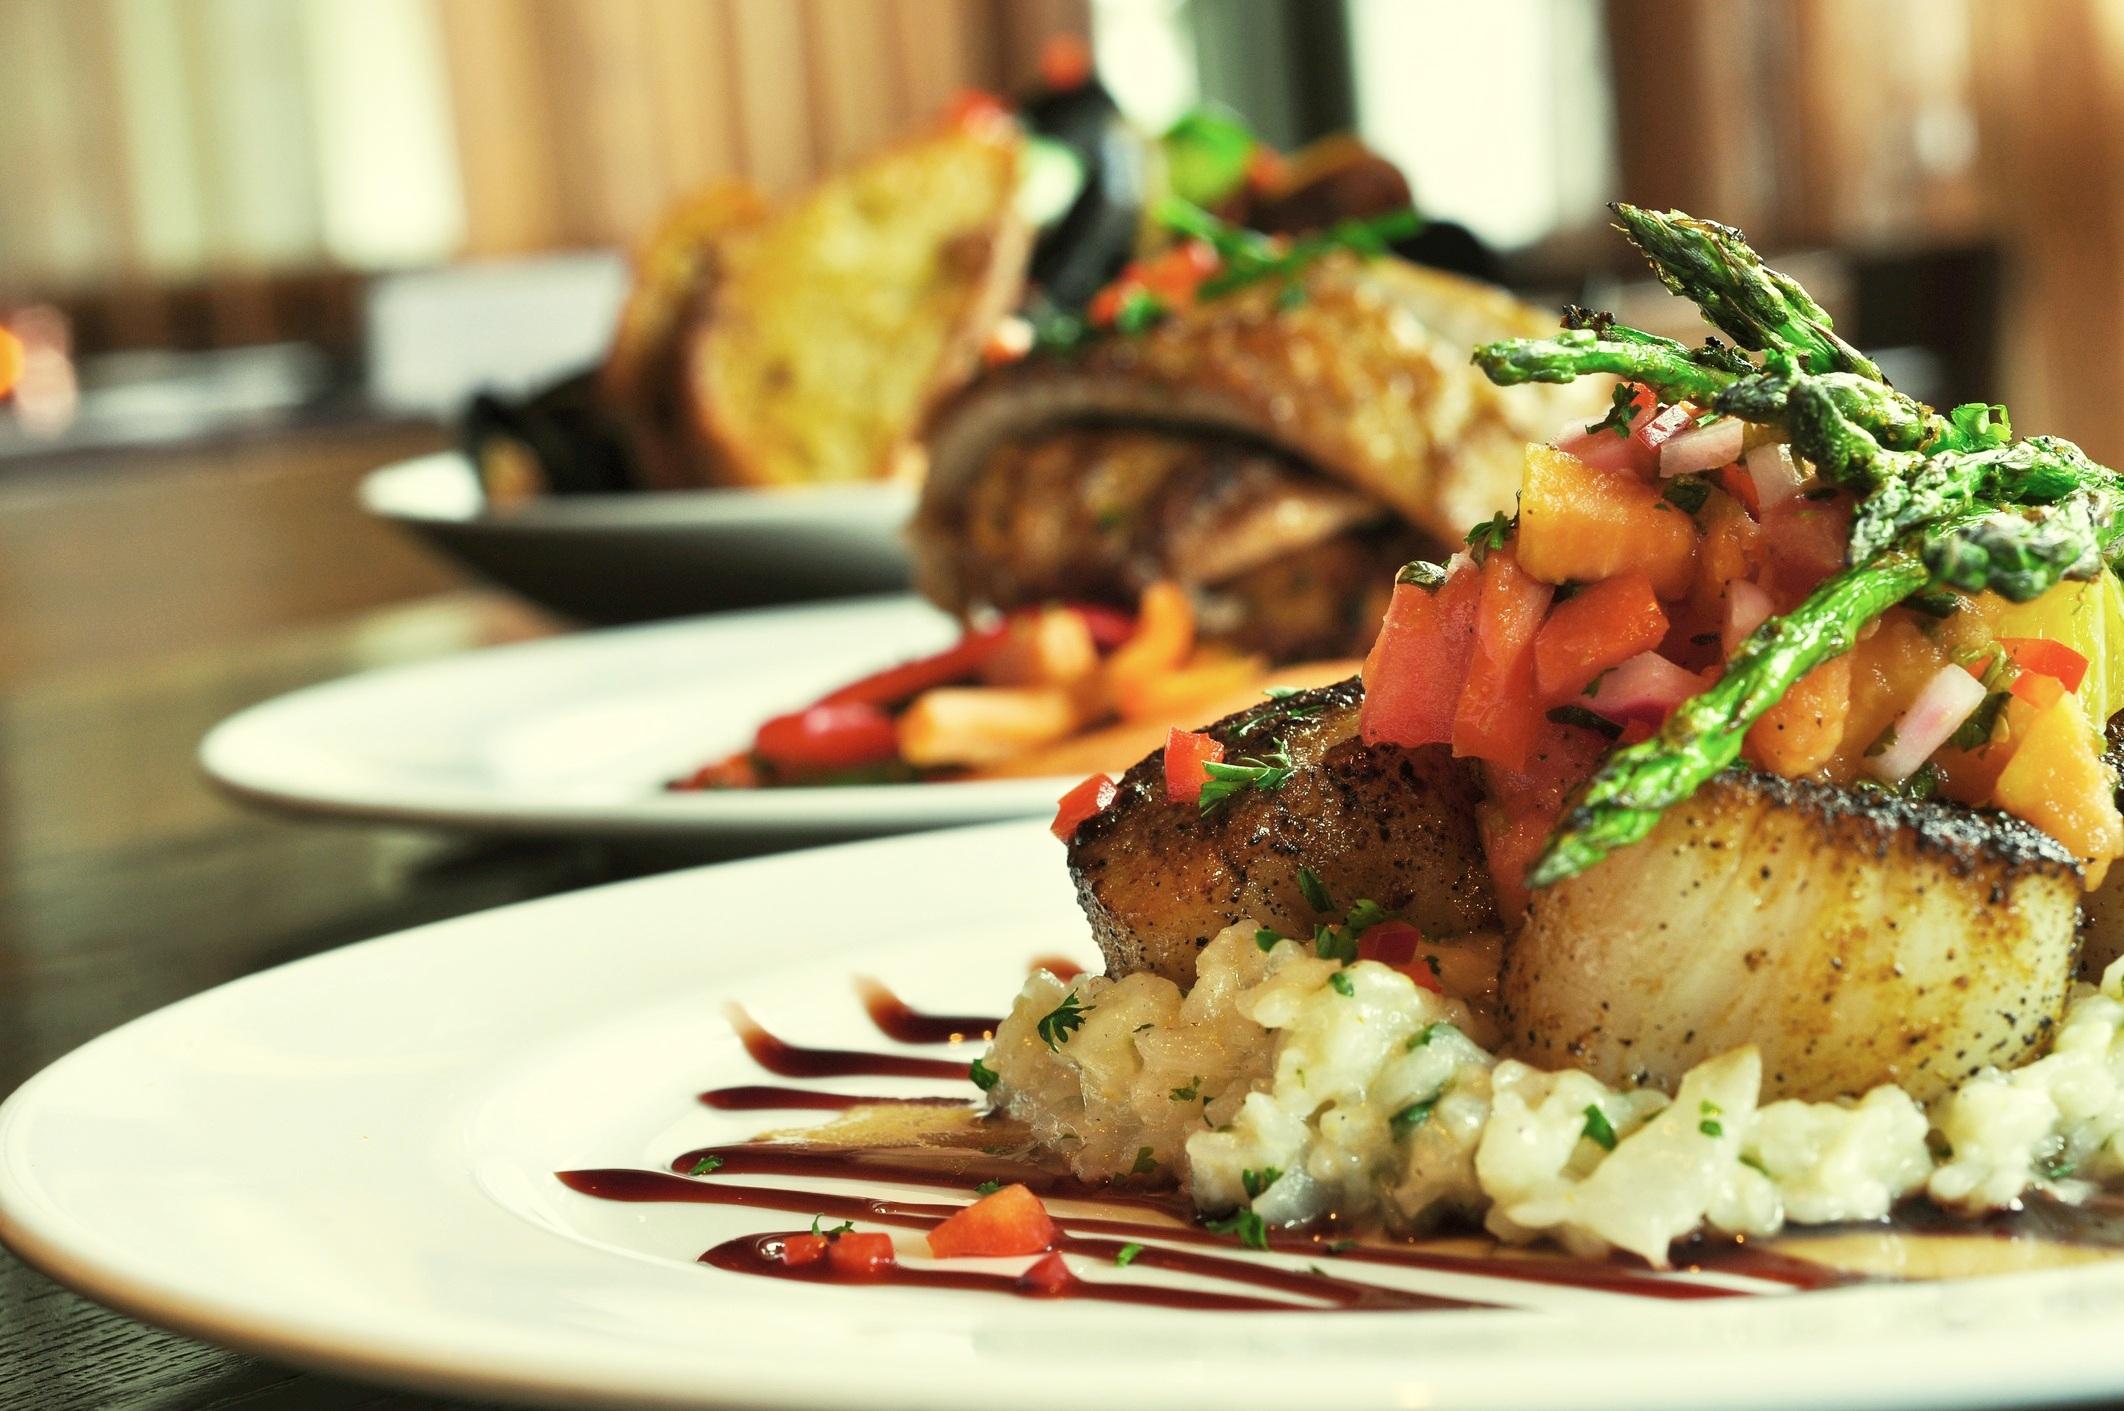 Restaurant-Plates-104704117_2125x1411.jpg